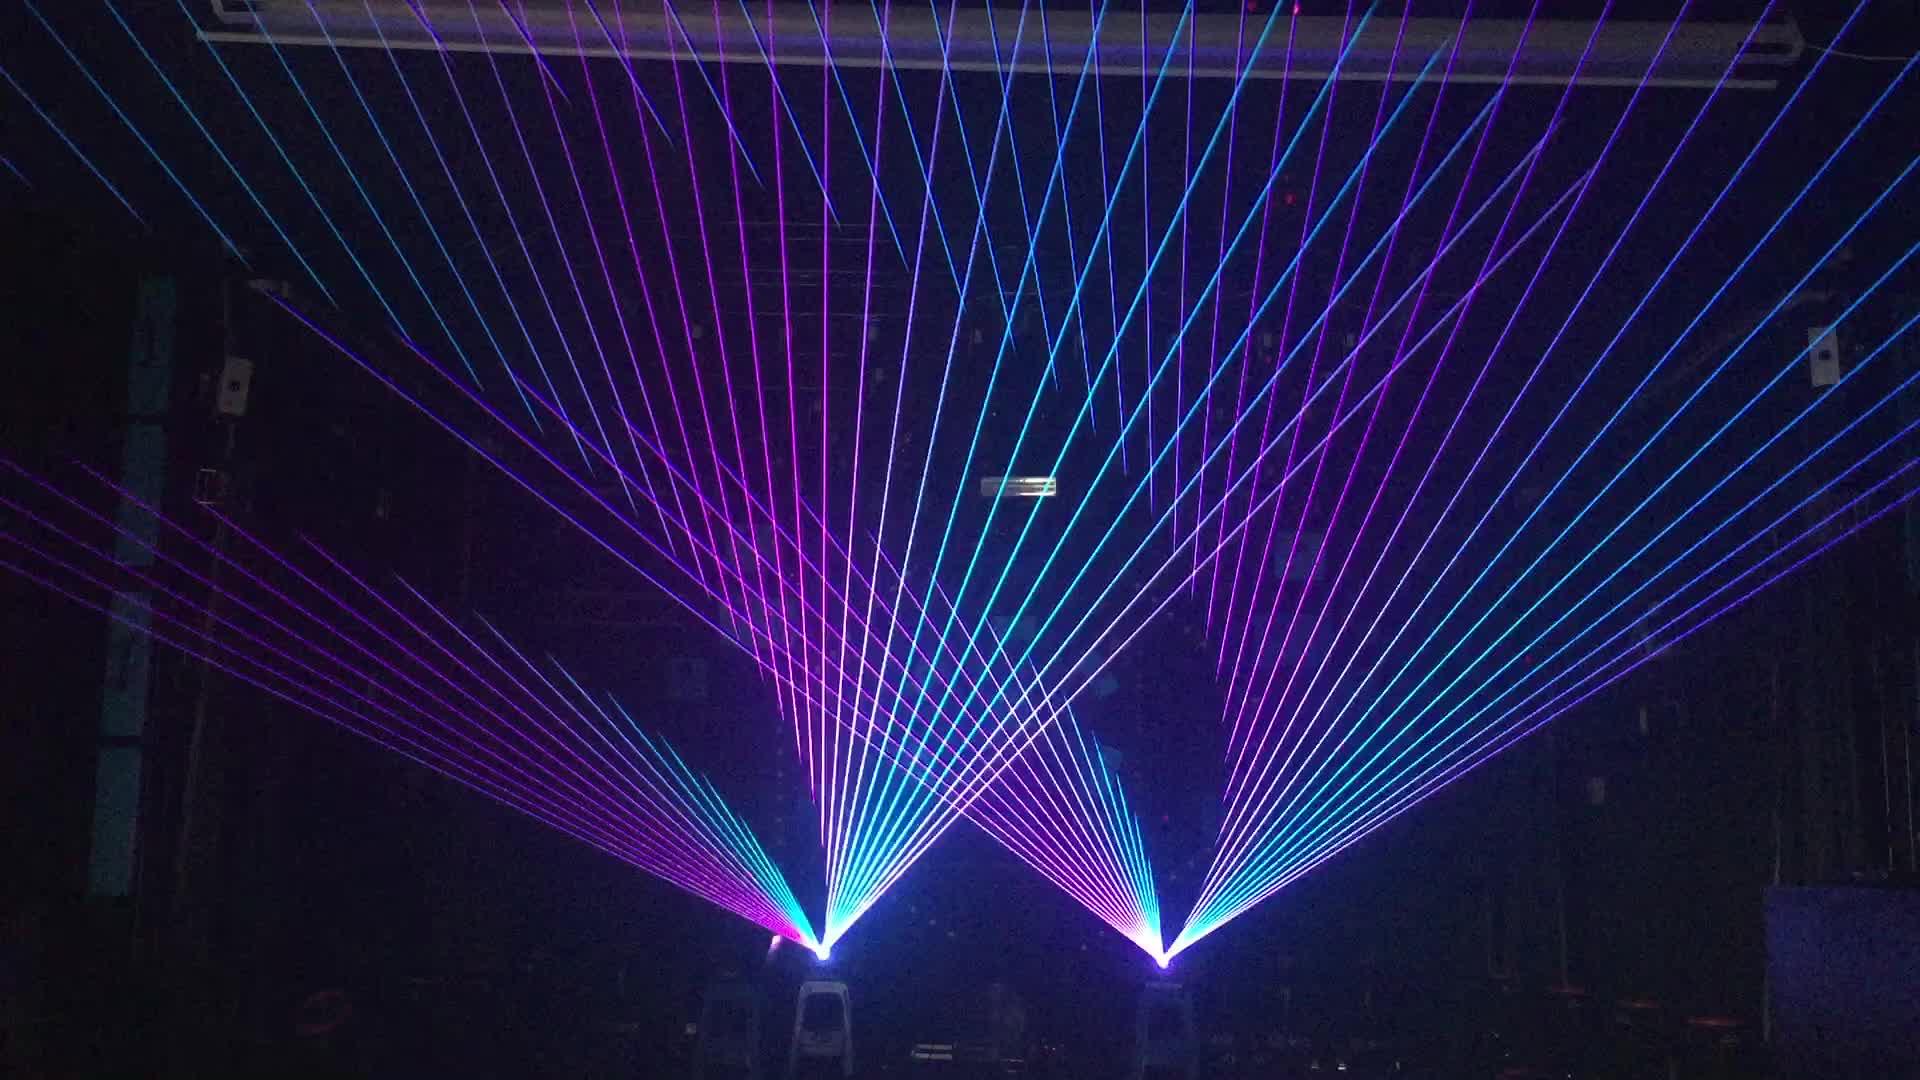 DMX เลเซอร์โปรเจคเตอร์ 5 วัตต์ RGB เวทีแสงเลเซอร์เครื่อง